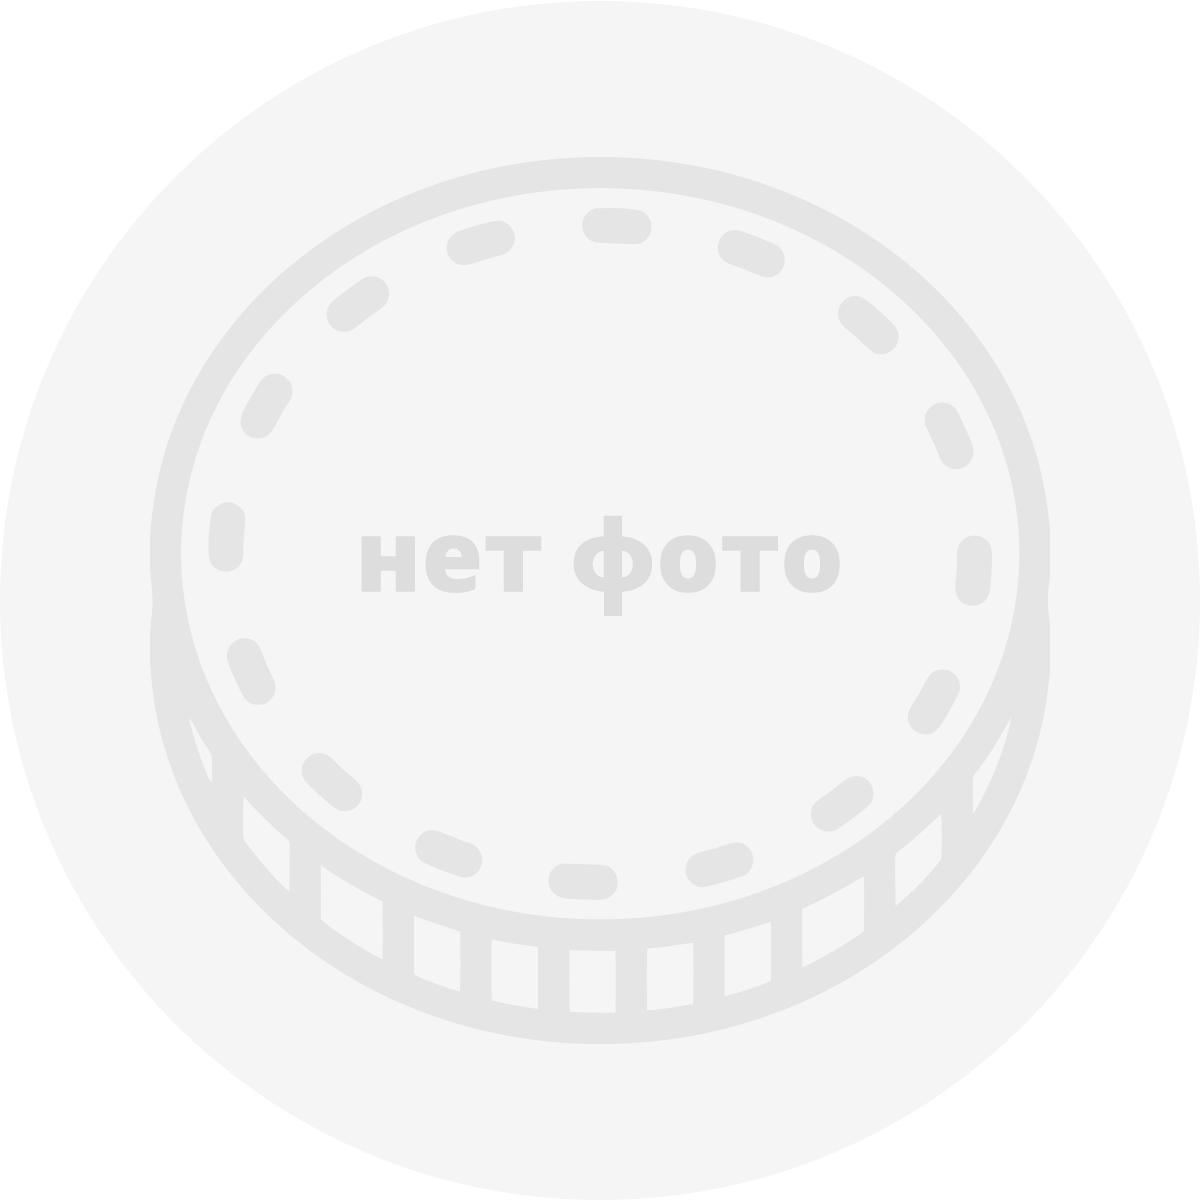 Югославия, 10 пар (1990 г.)